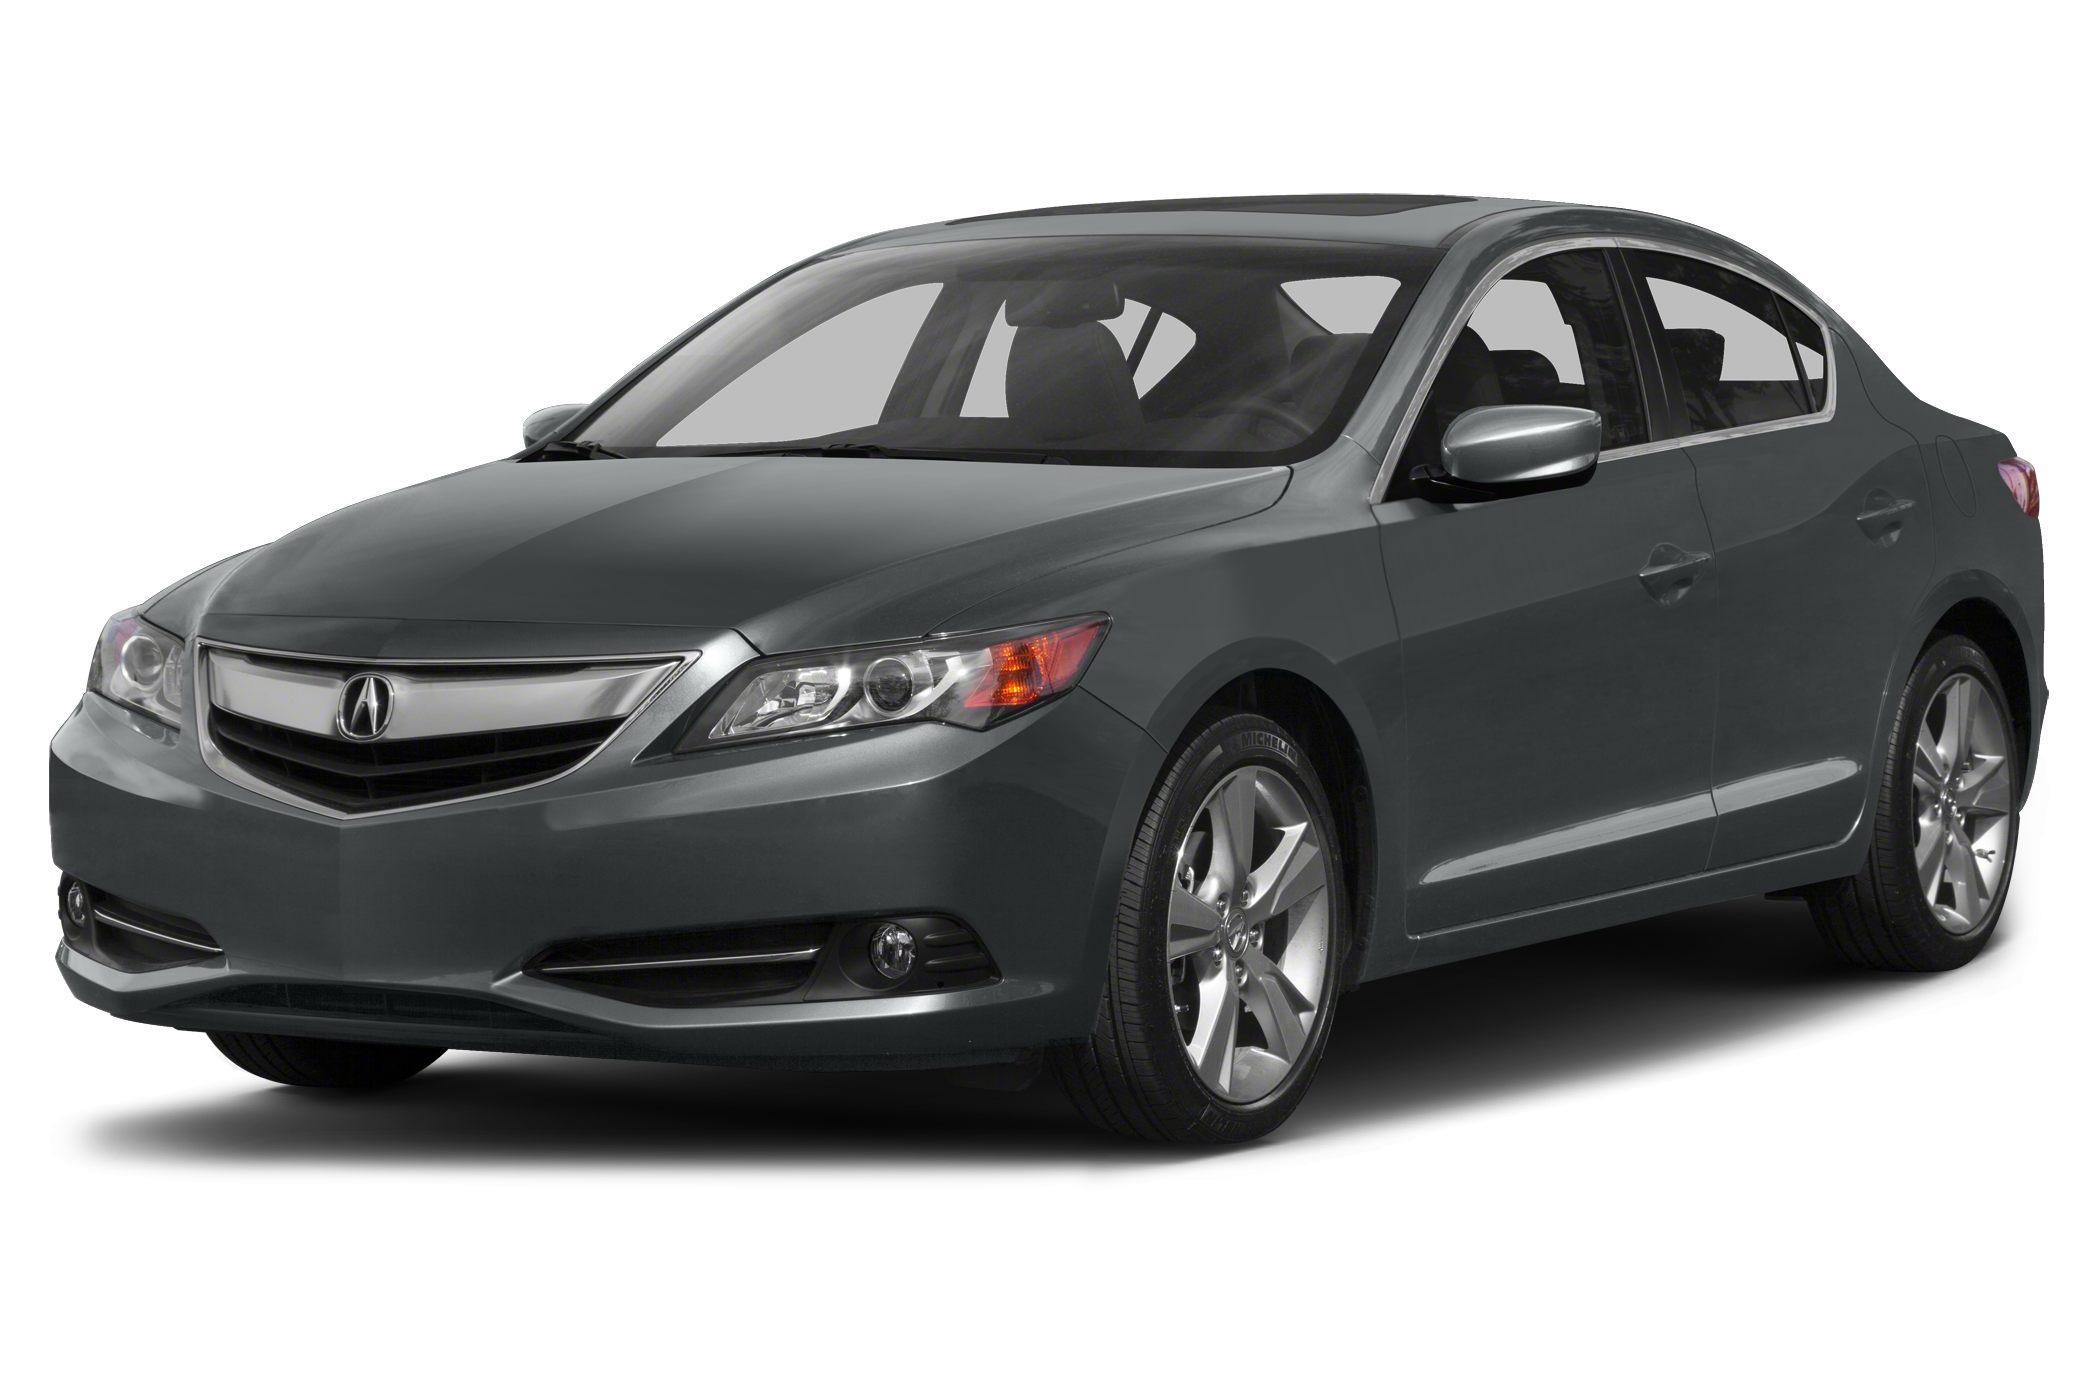 2013 Acura ILX New Car Test Drive